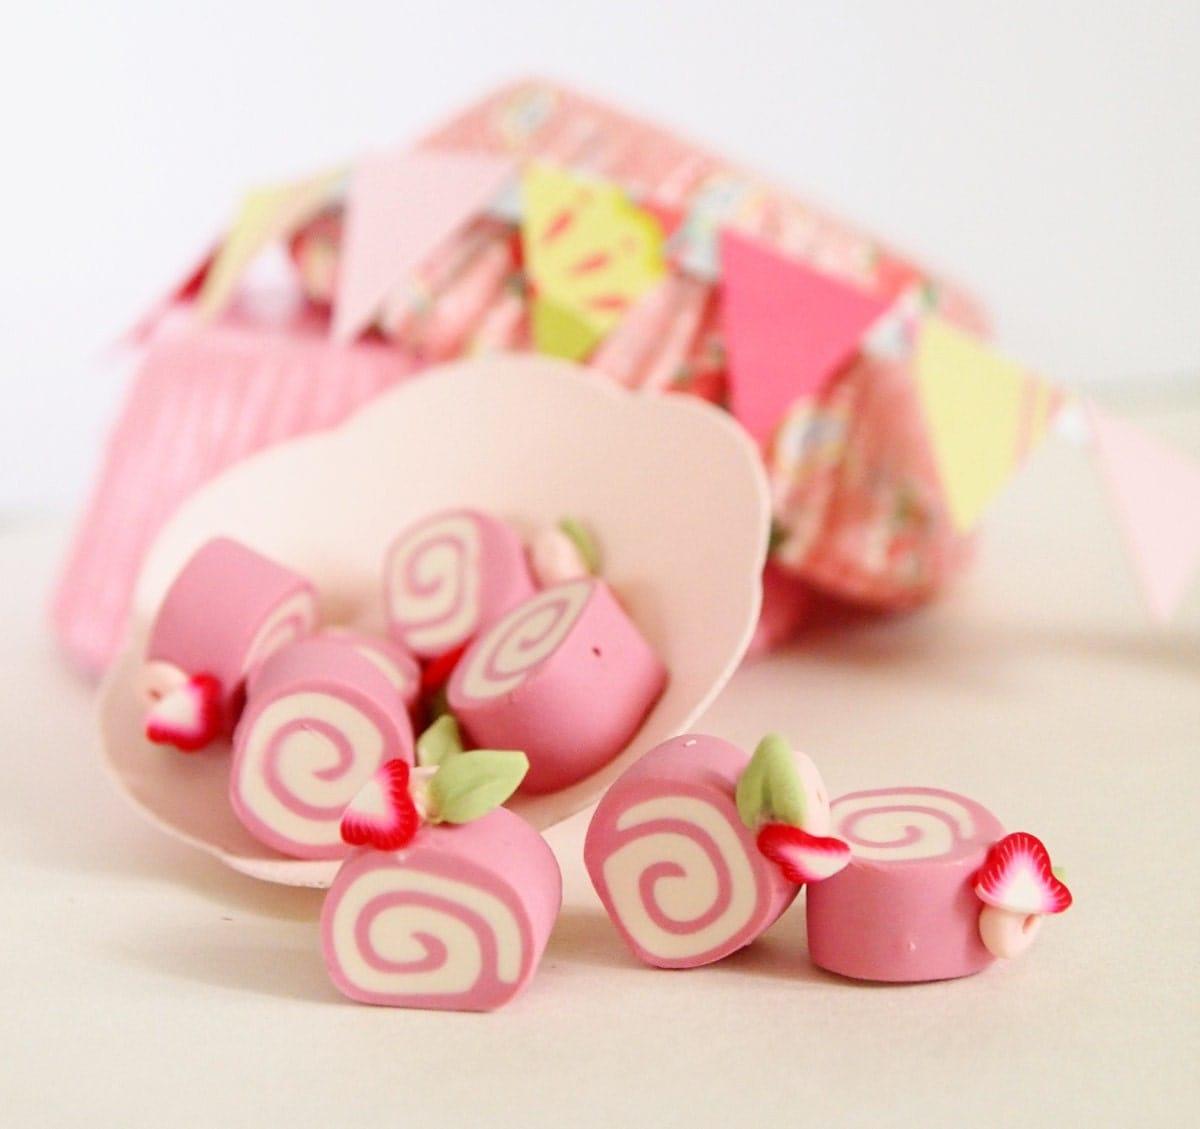 Handmade Cake beads, 5pcs Miniature Strawberry Roll Cake Charm